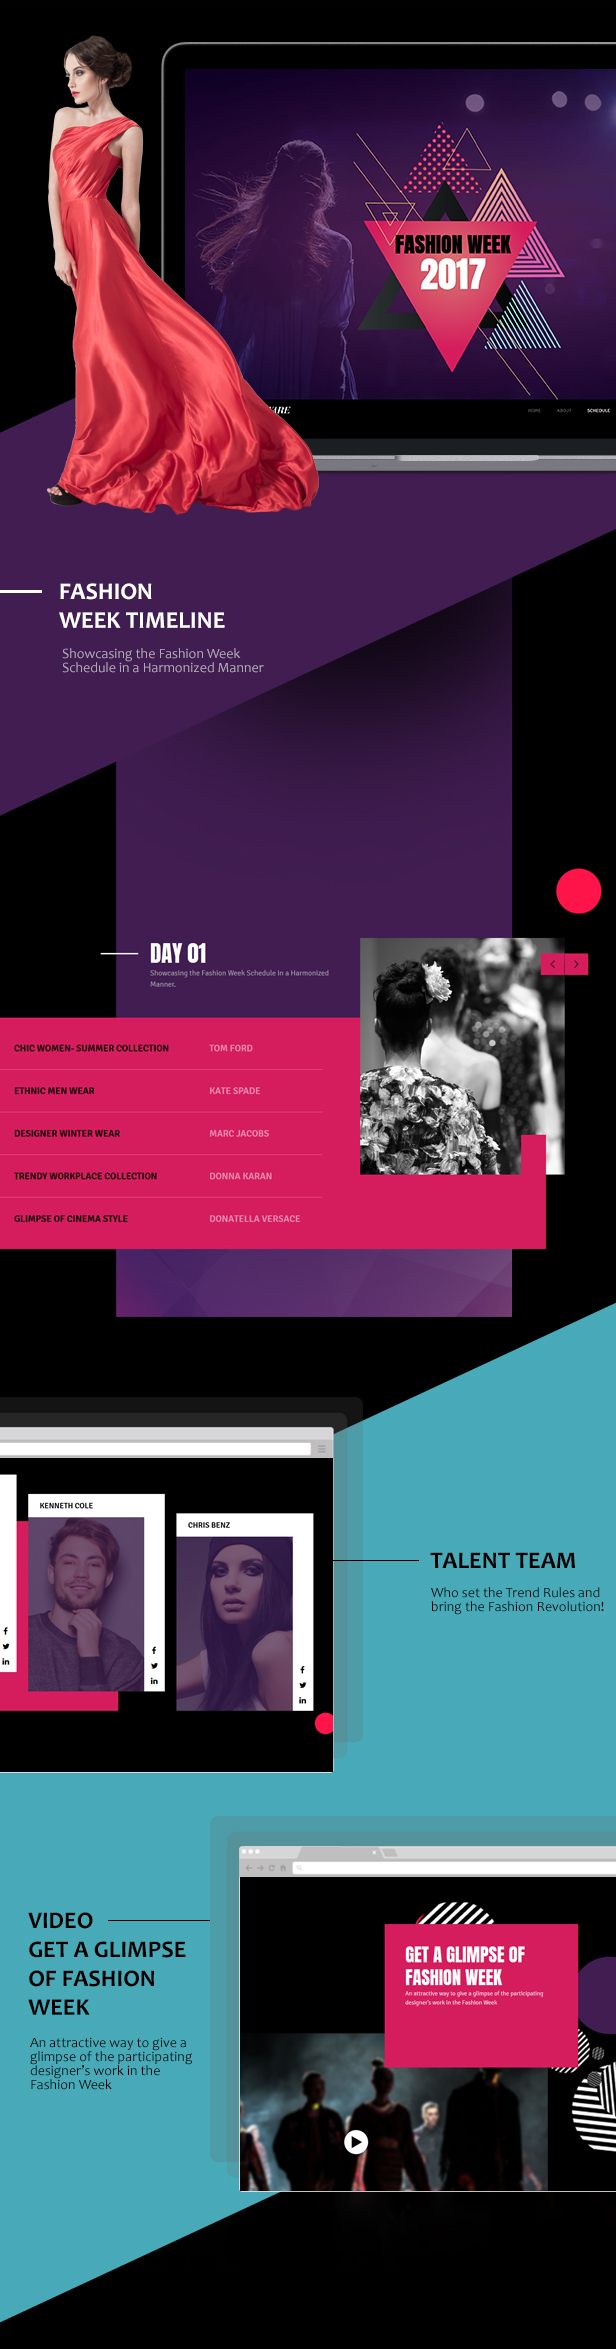 Buzzware - Fashion Week & Beauty Event HTML5 Responsive Website Template - 1